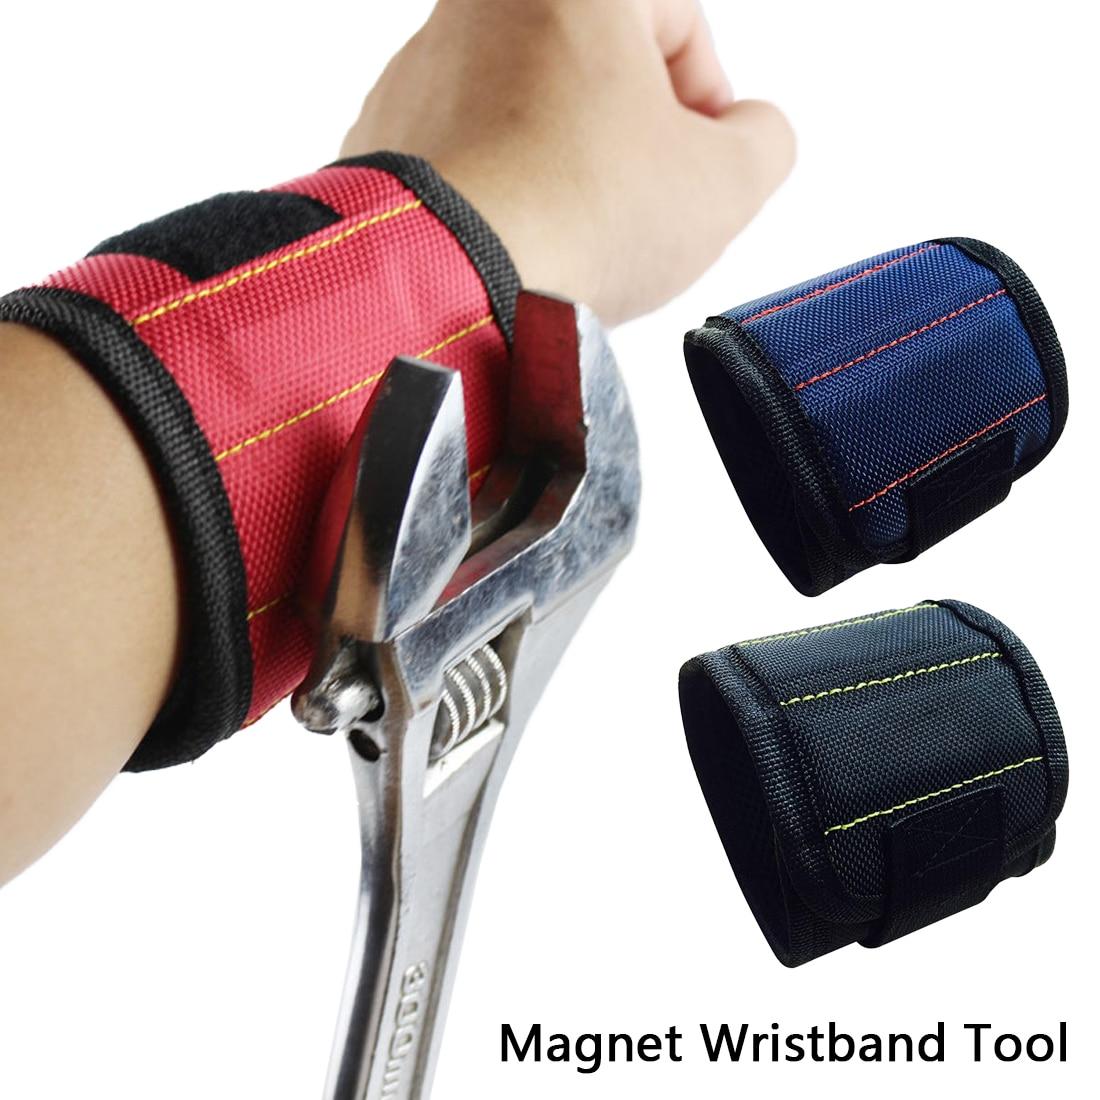 Strong 3 Magnetic Magnet Wristband Pocket Wrist Support Tool Bag Hand Bracelet Pouch Bag Screws Drill Holder